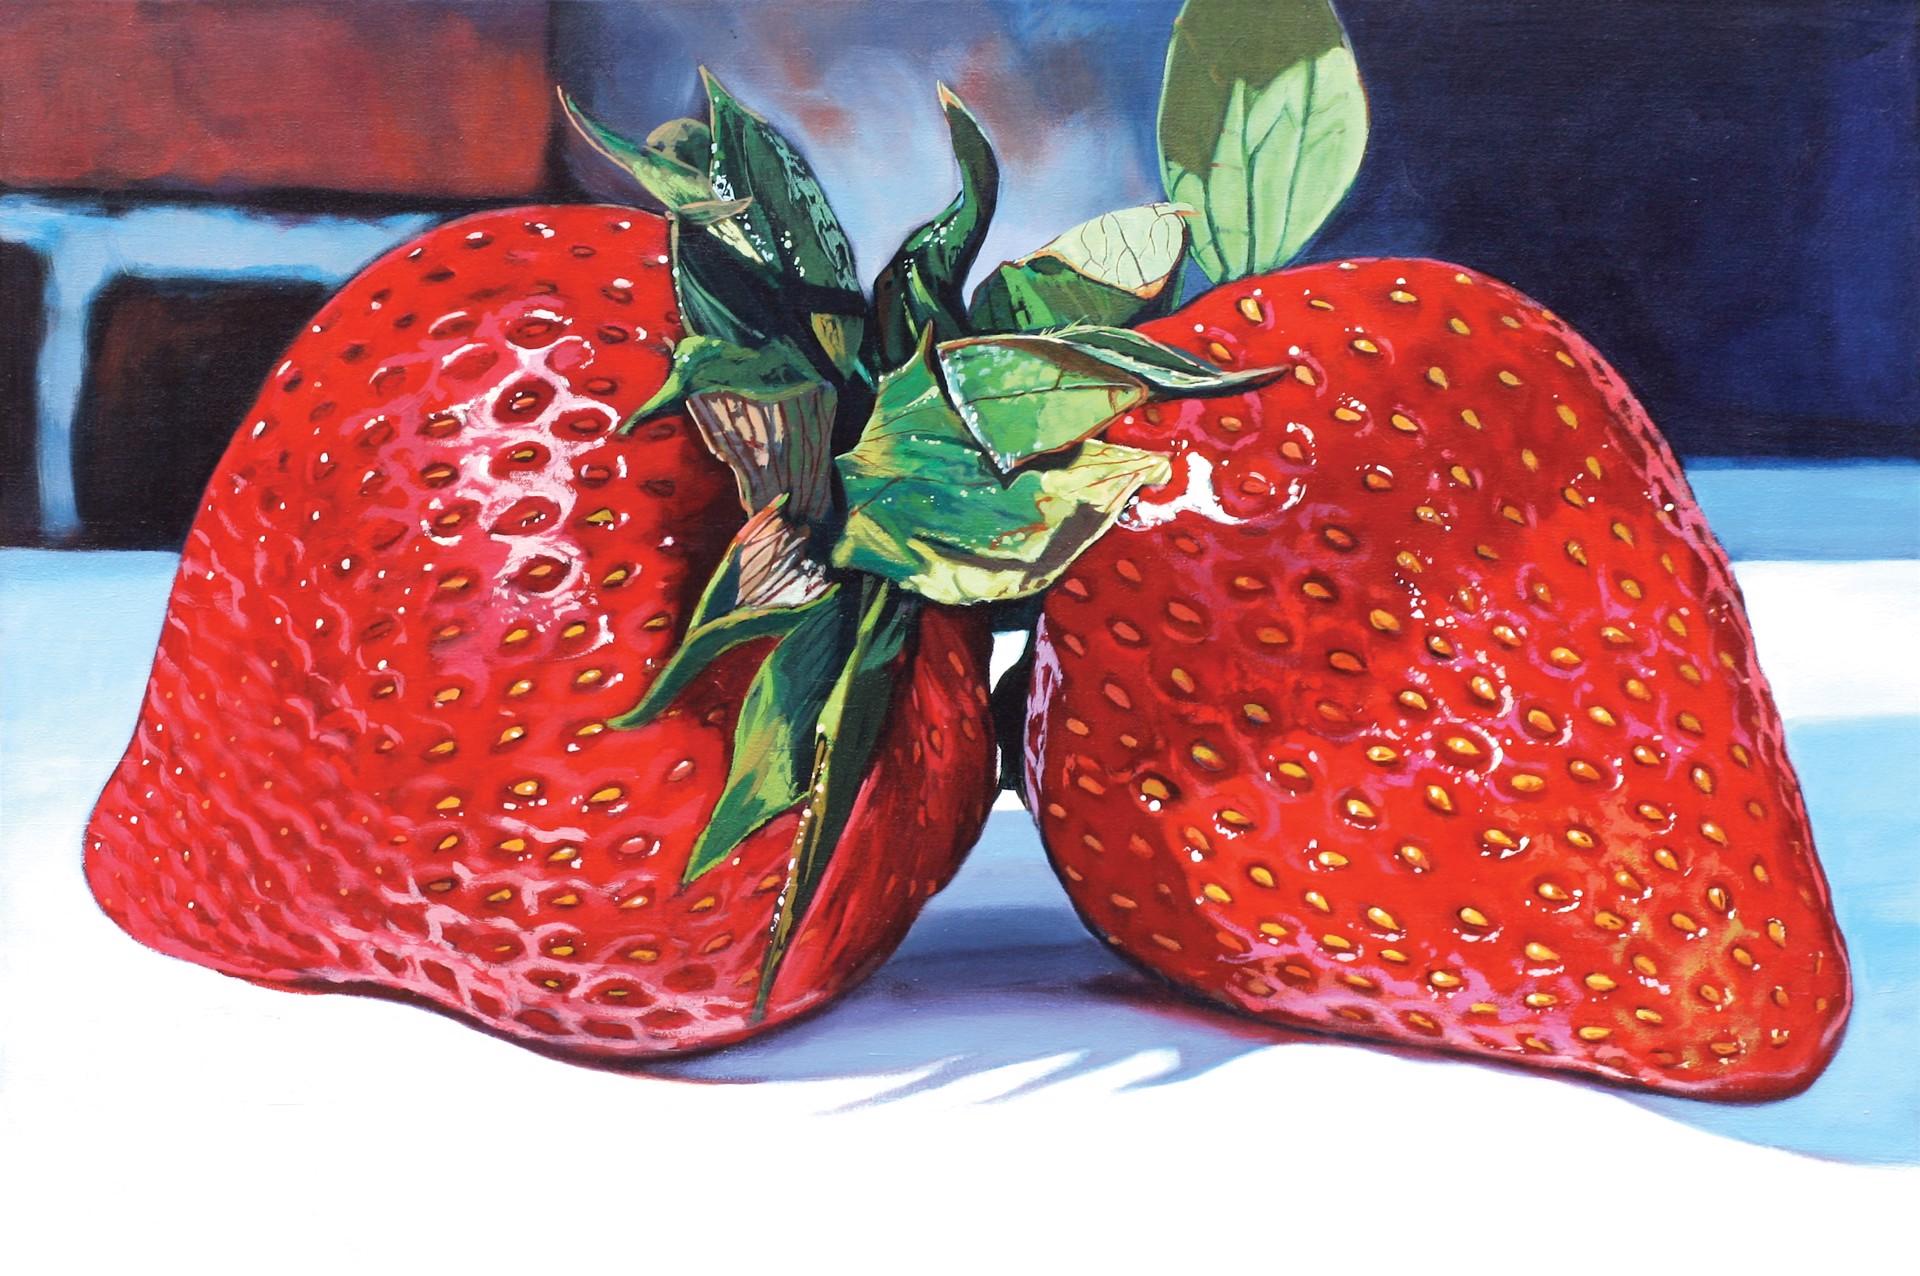 So Succulent Strawberries by Scott Hewett